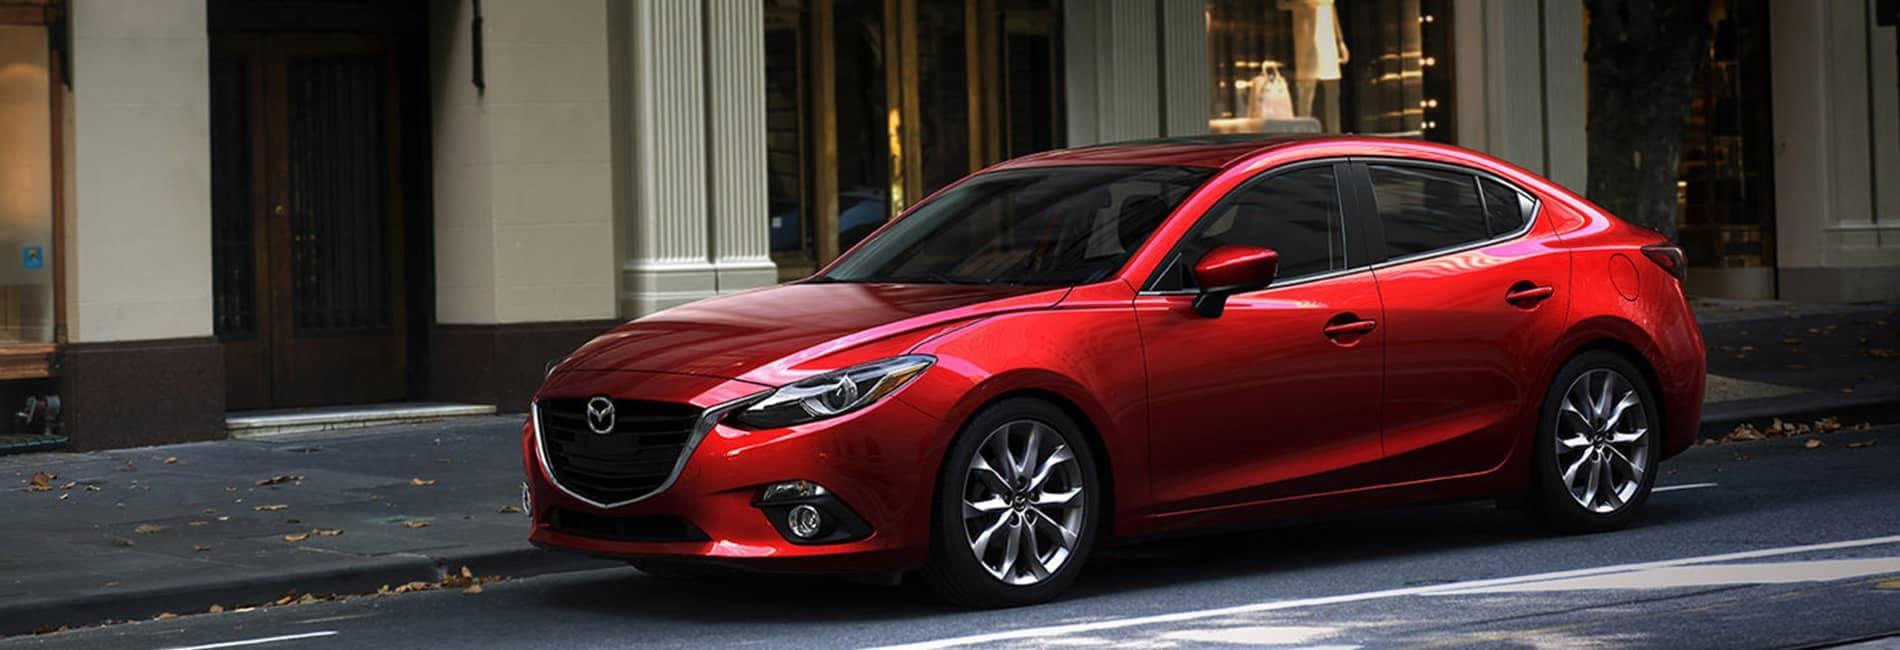 Mazda-Banner-1